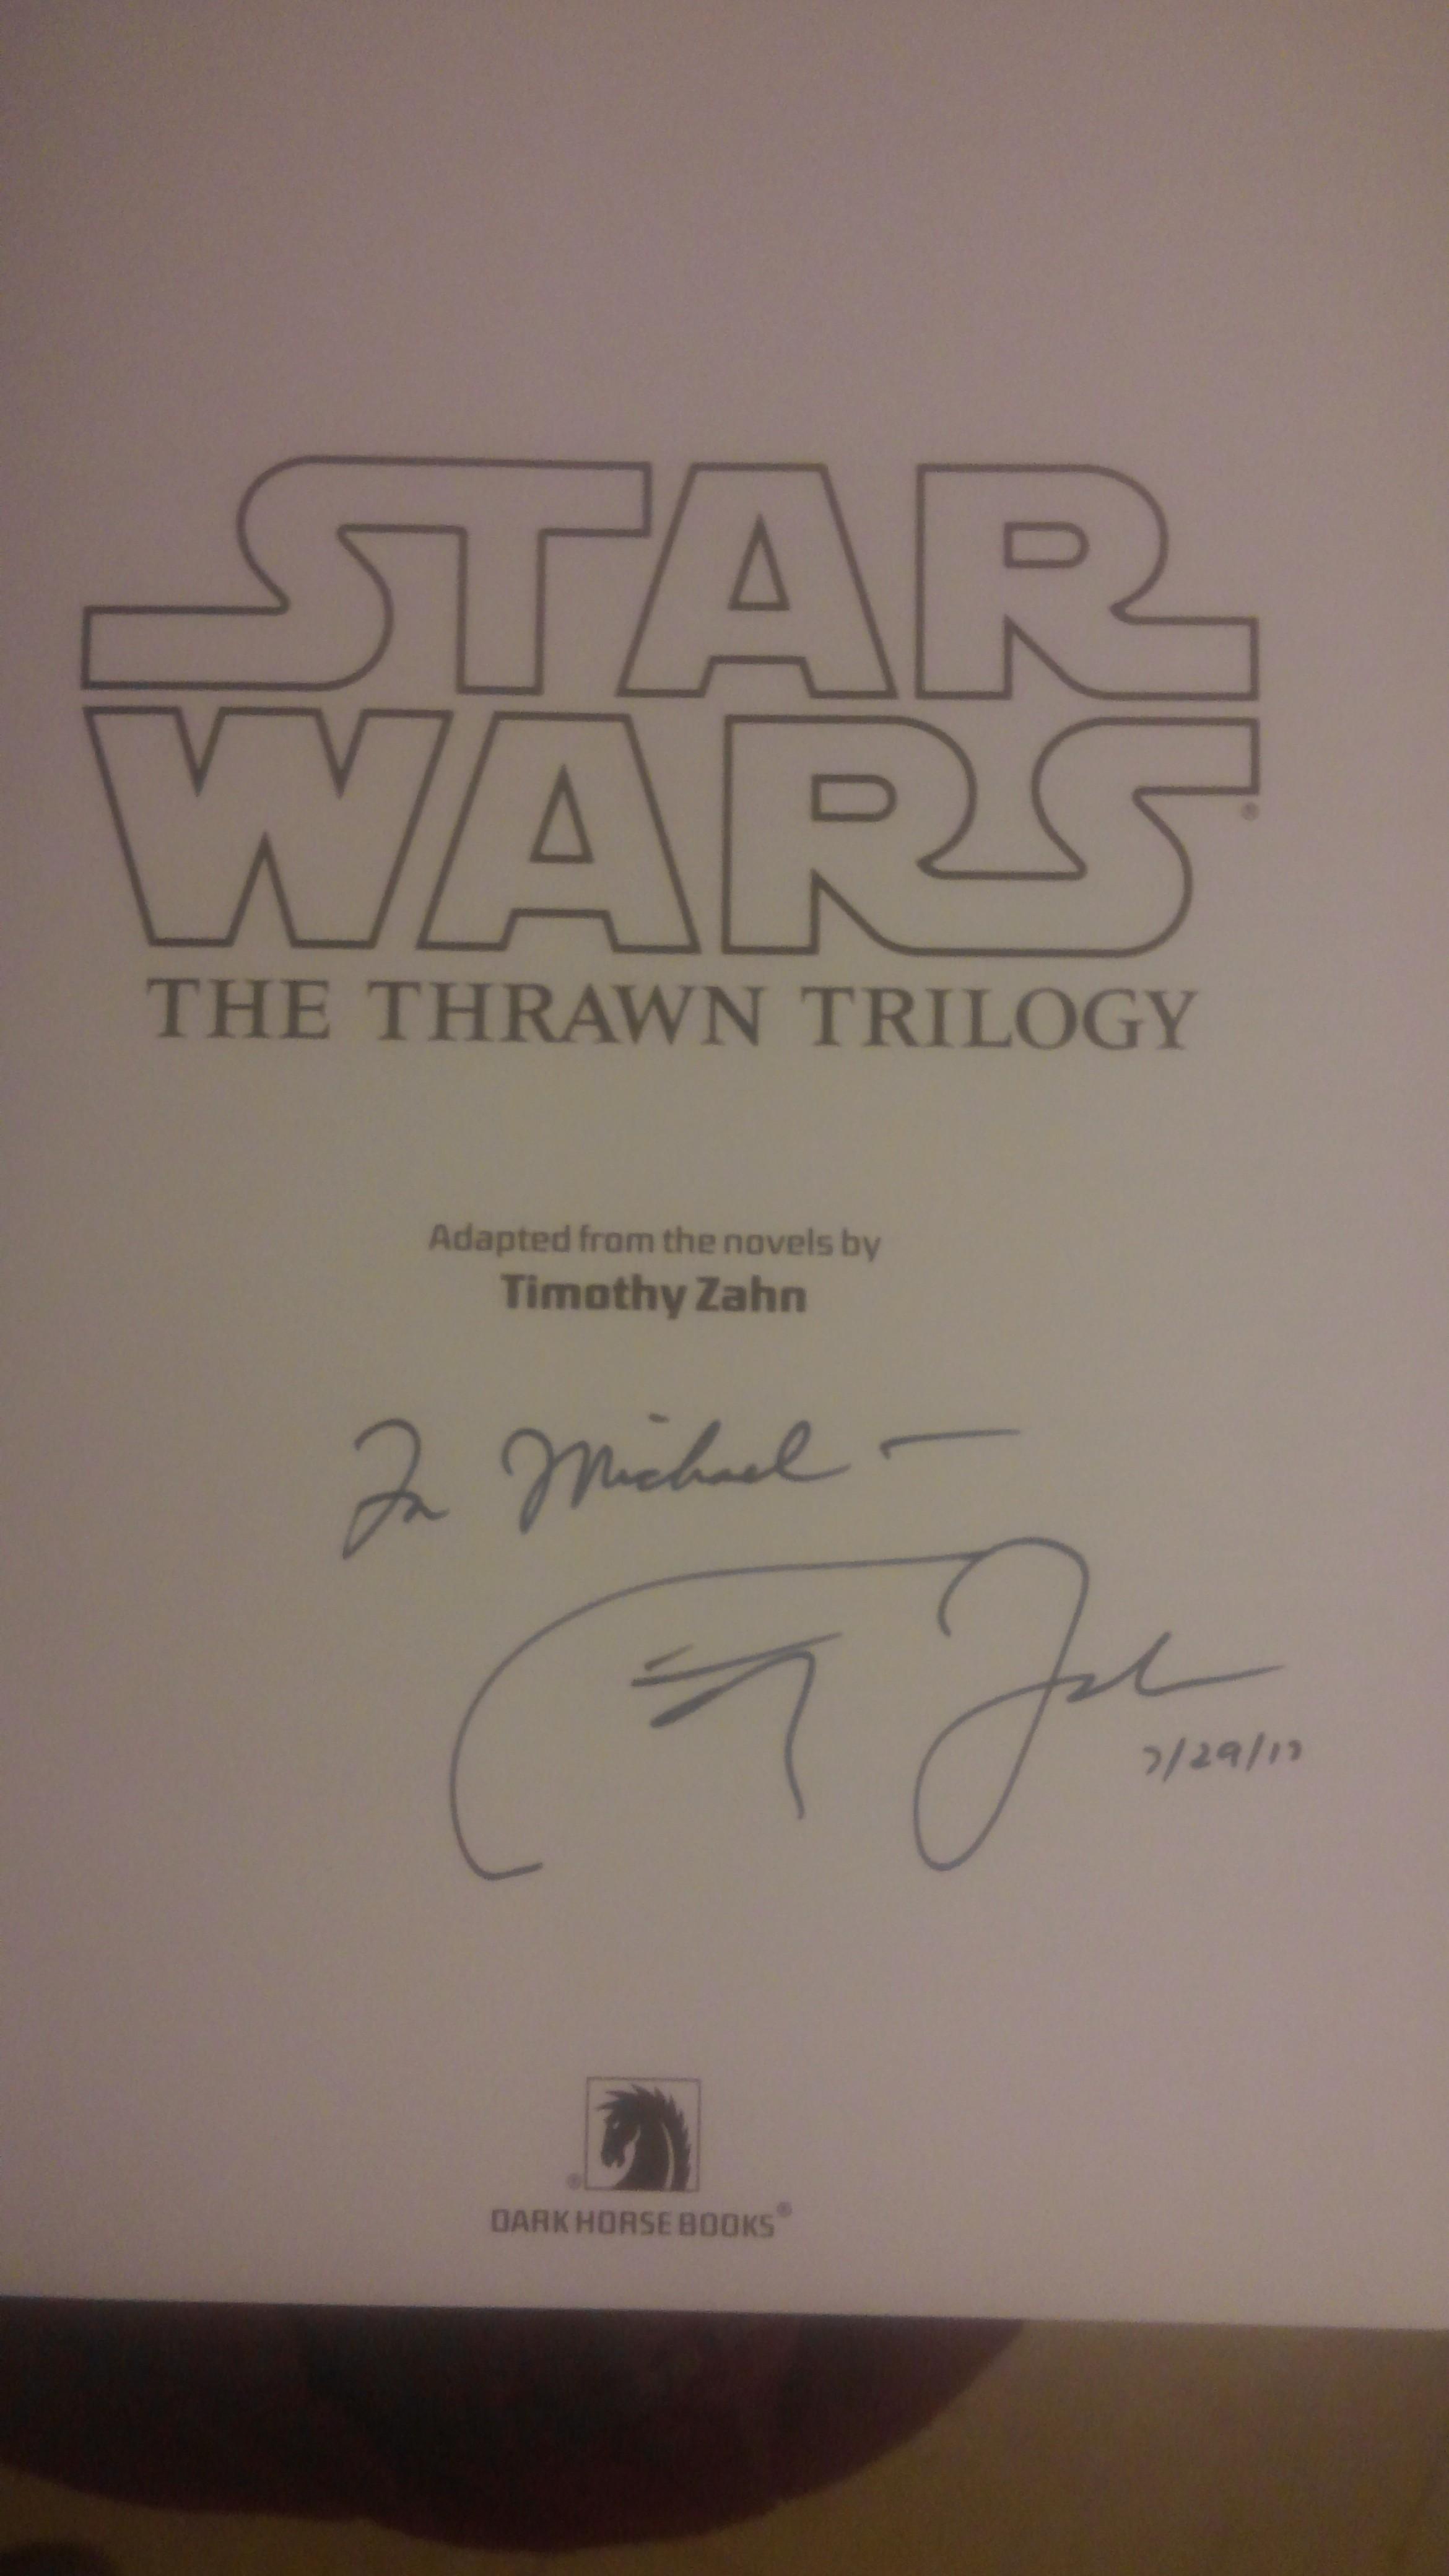 Timothy Zahn autograph